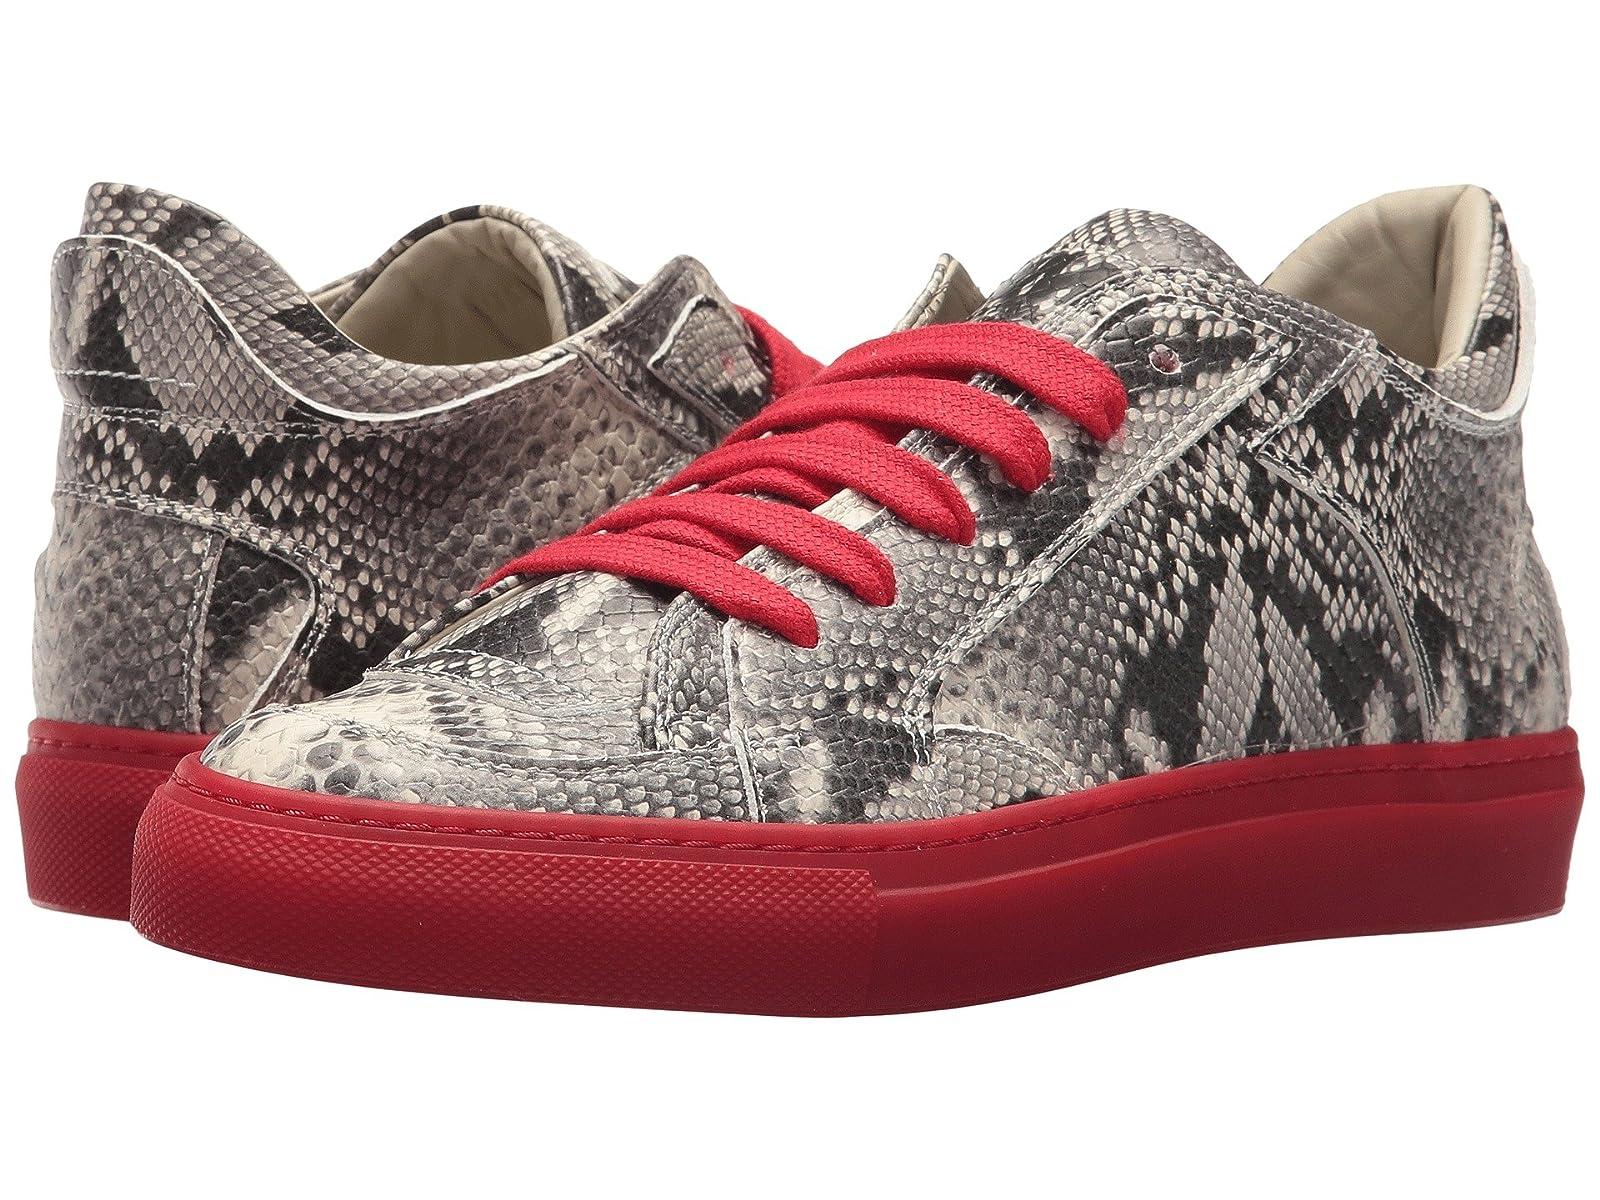 MM6 Maison Margiela Contrast Lace SneakerCheap and distinctive eye-catching shoes